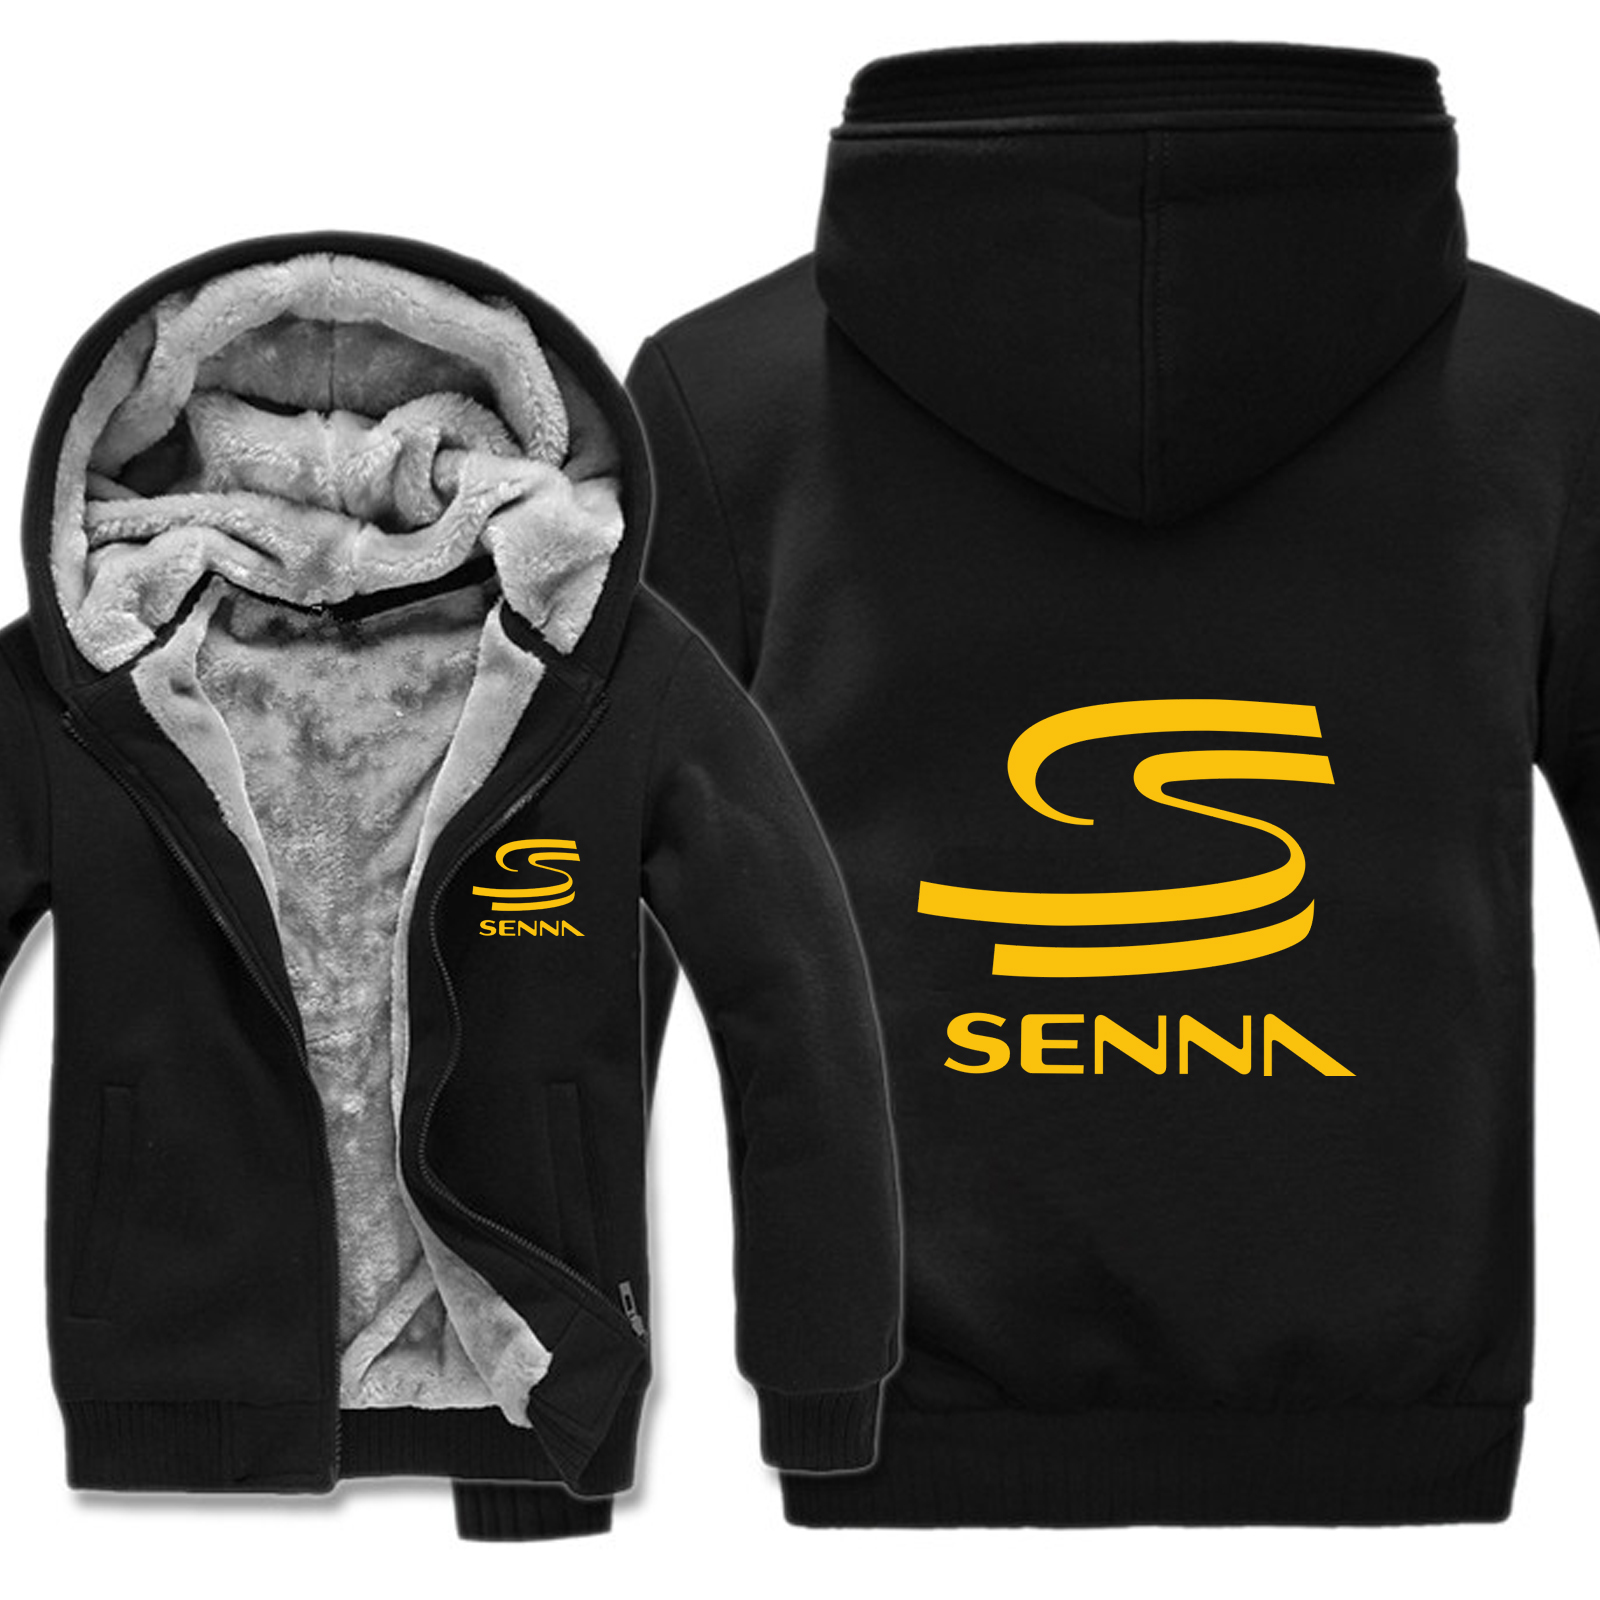 hero-ayrton-font-b-senna-b-font-winter-casual-loose-fashion-man-zipper-hoodie-thick-cotton-fleece-men-hoodies-f1-font-b-senna-b-font-coat-sweatshirt-hs-032